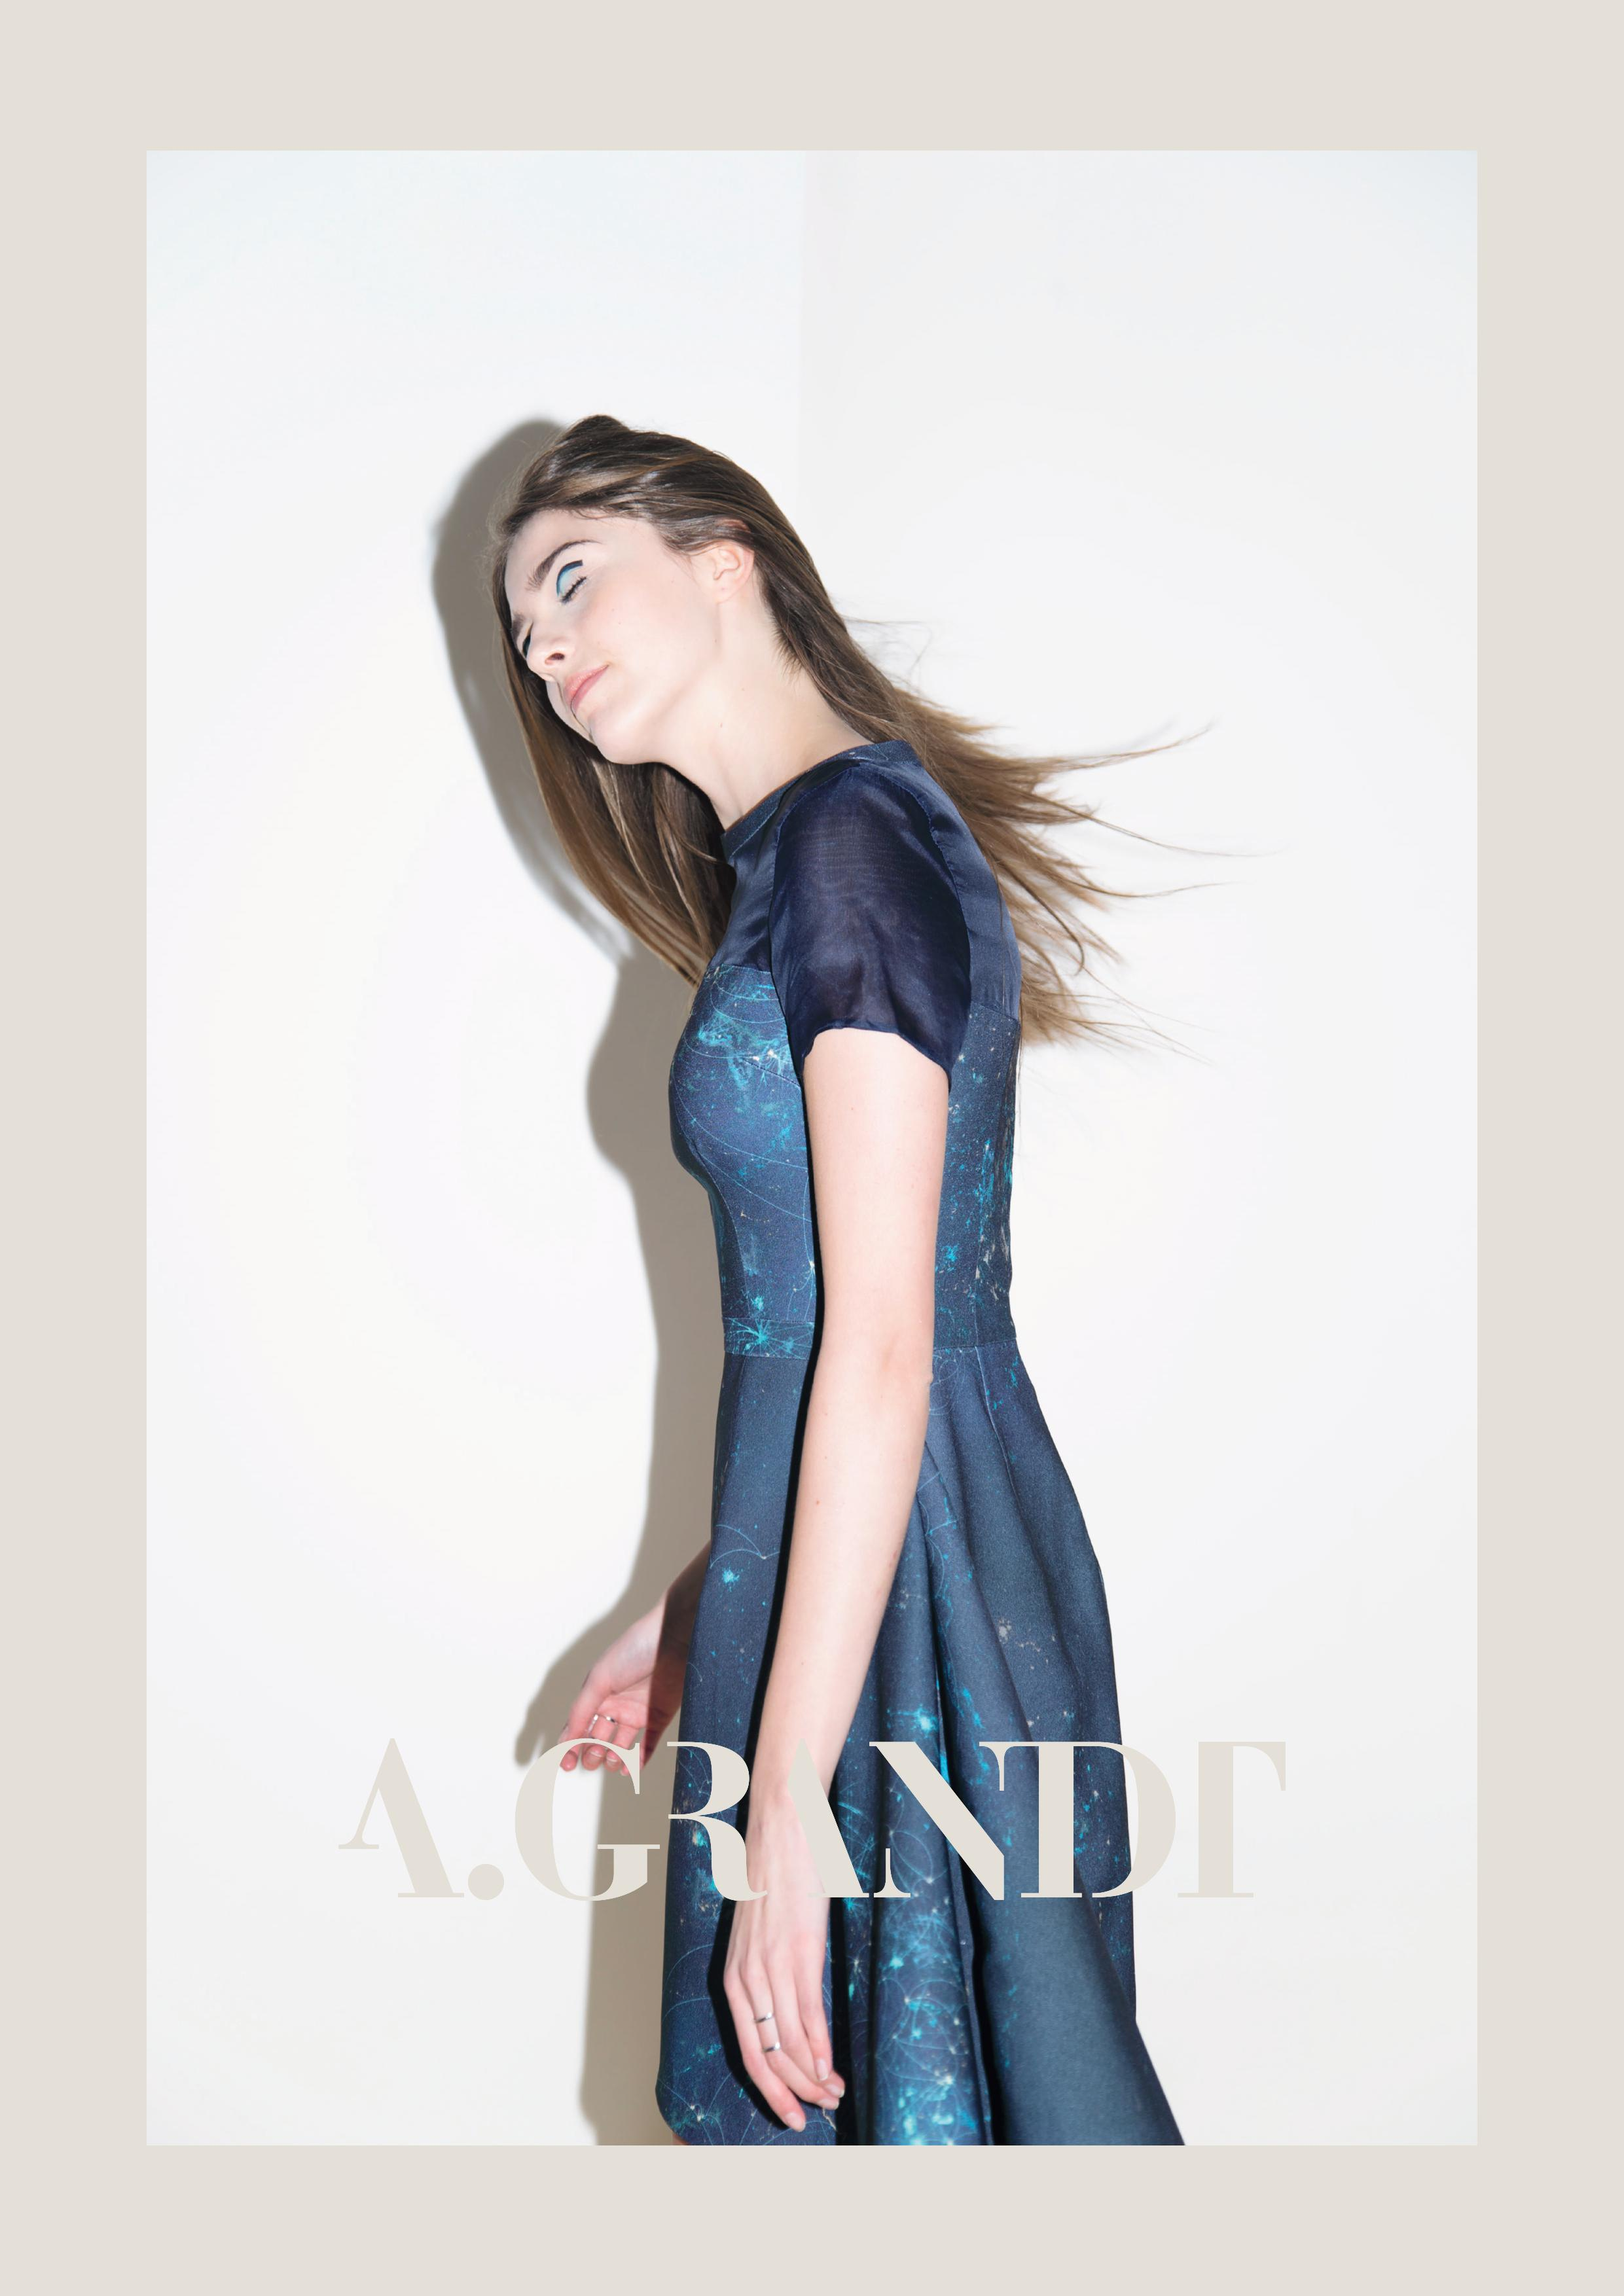 Photography: Studio Daylight 44 and  Breno Mayer . Styling: The amazing  Róisín Moloney  Model: Avice ( Morgan Agency ) Makeup:  Bianca Rafaella